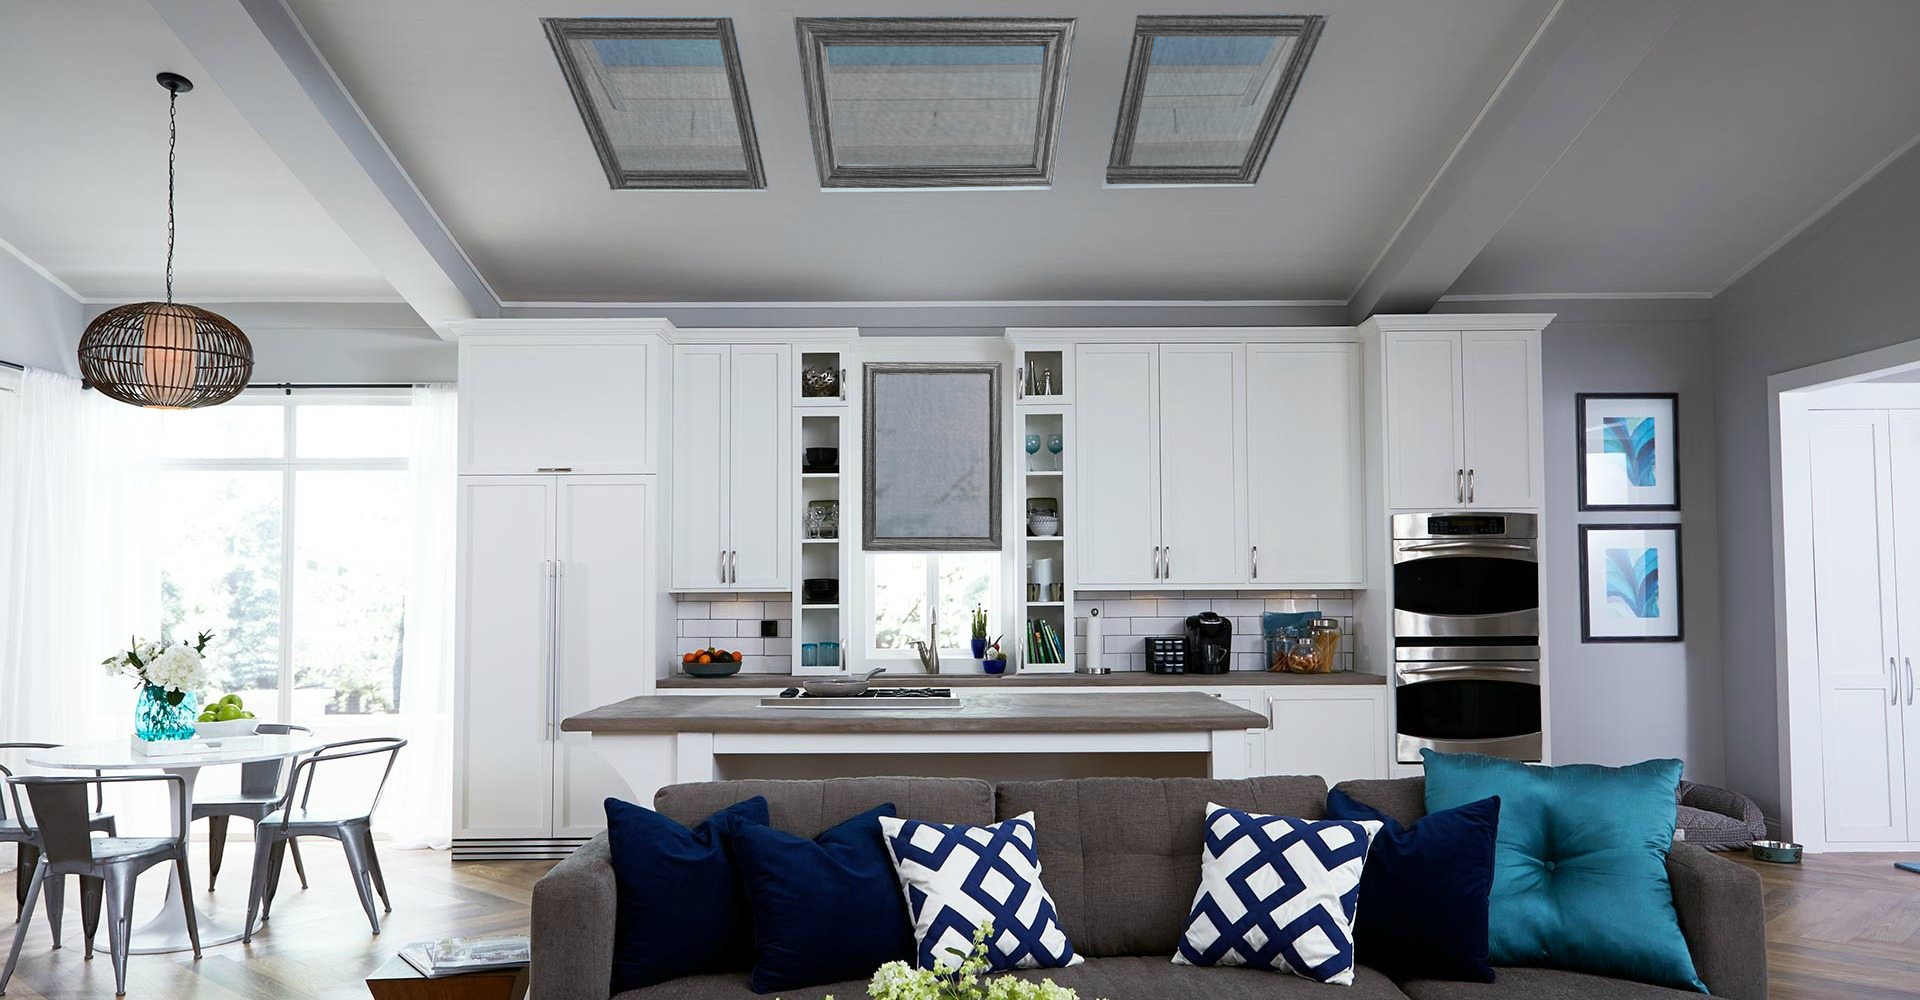 Skylight Kitchen WIndow Cover